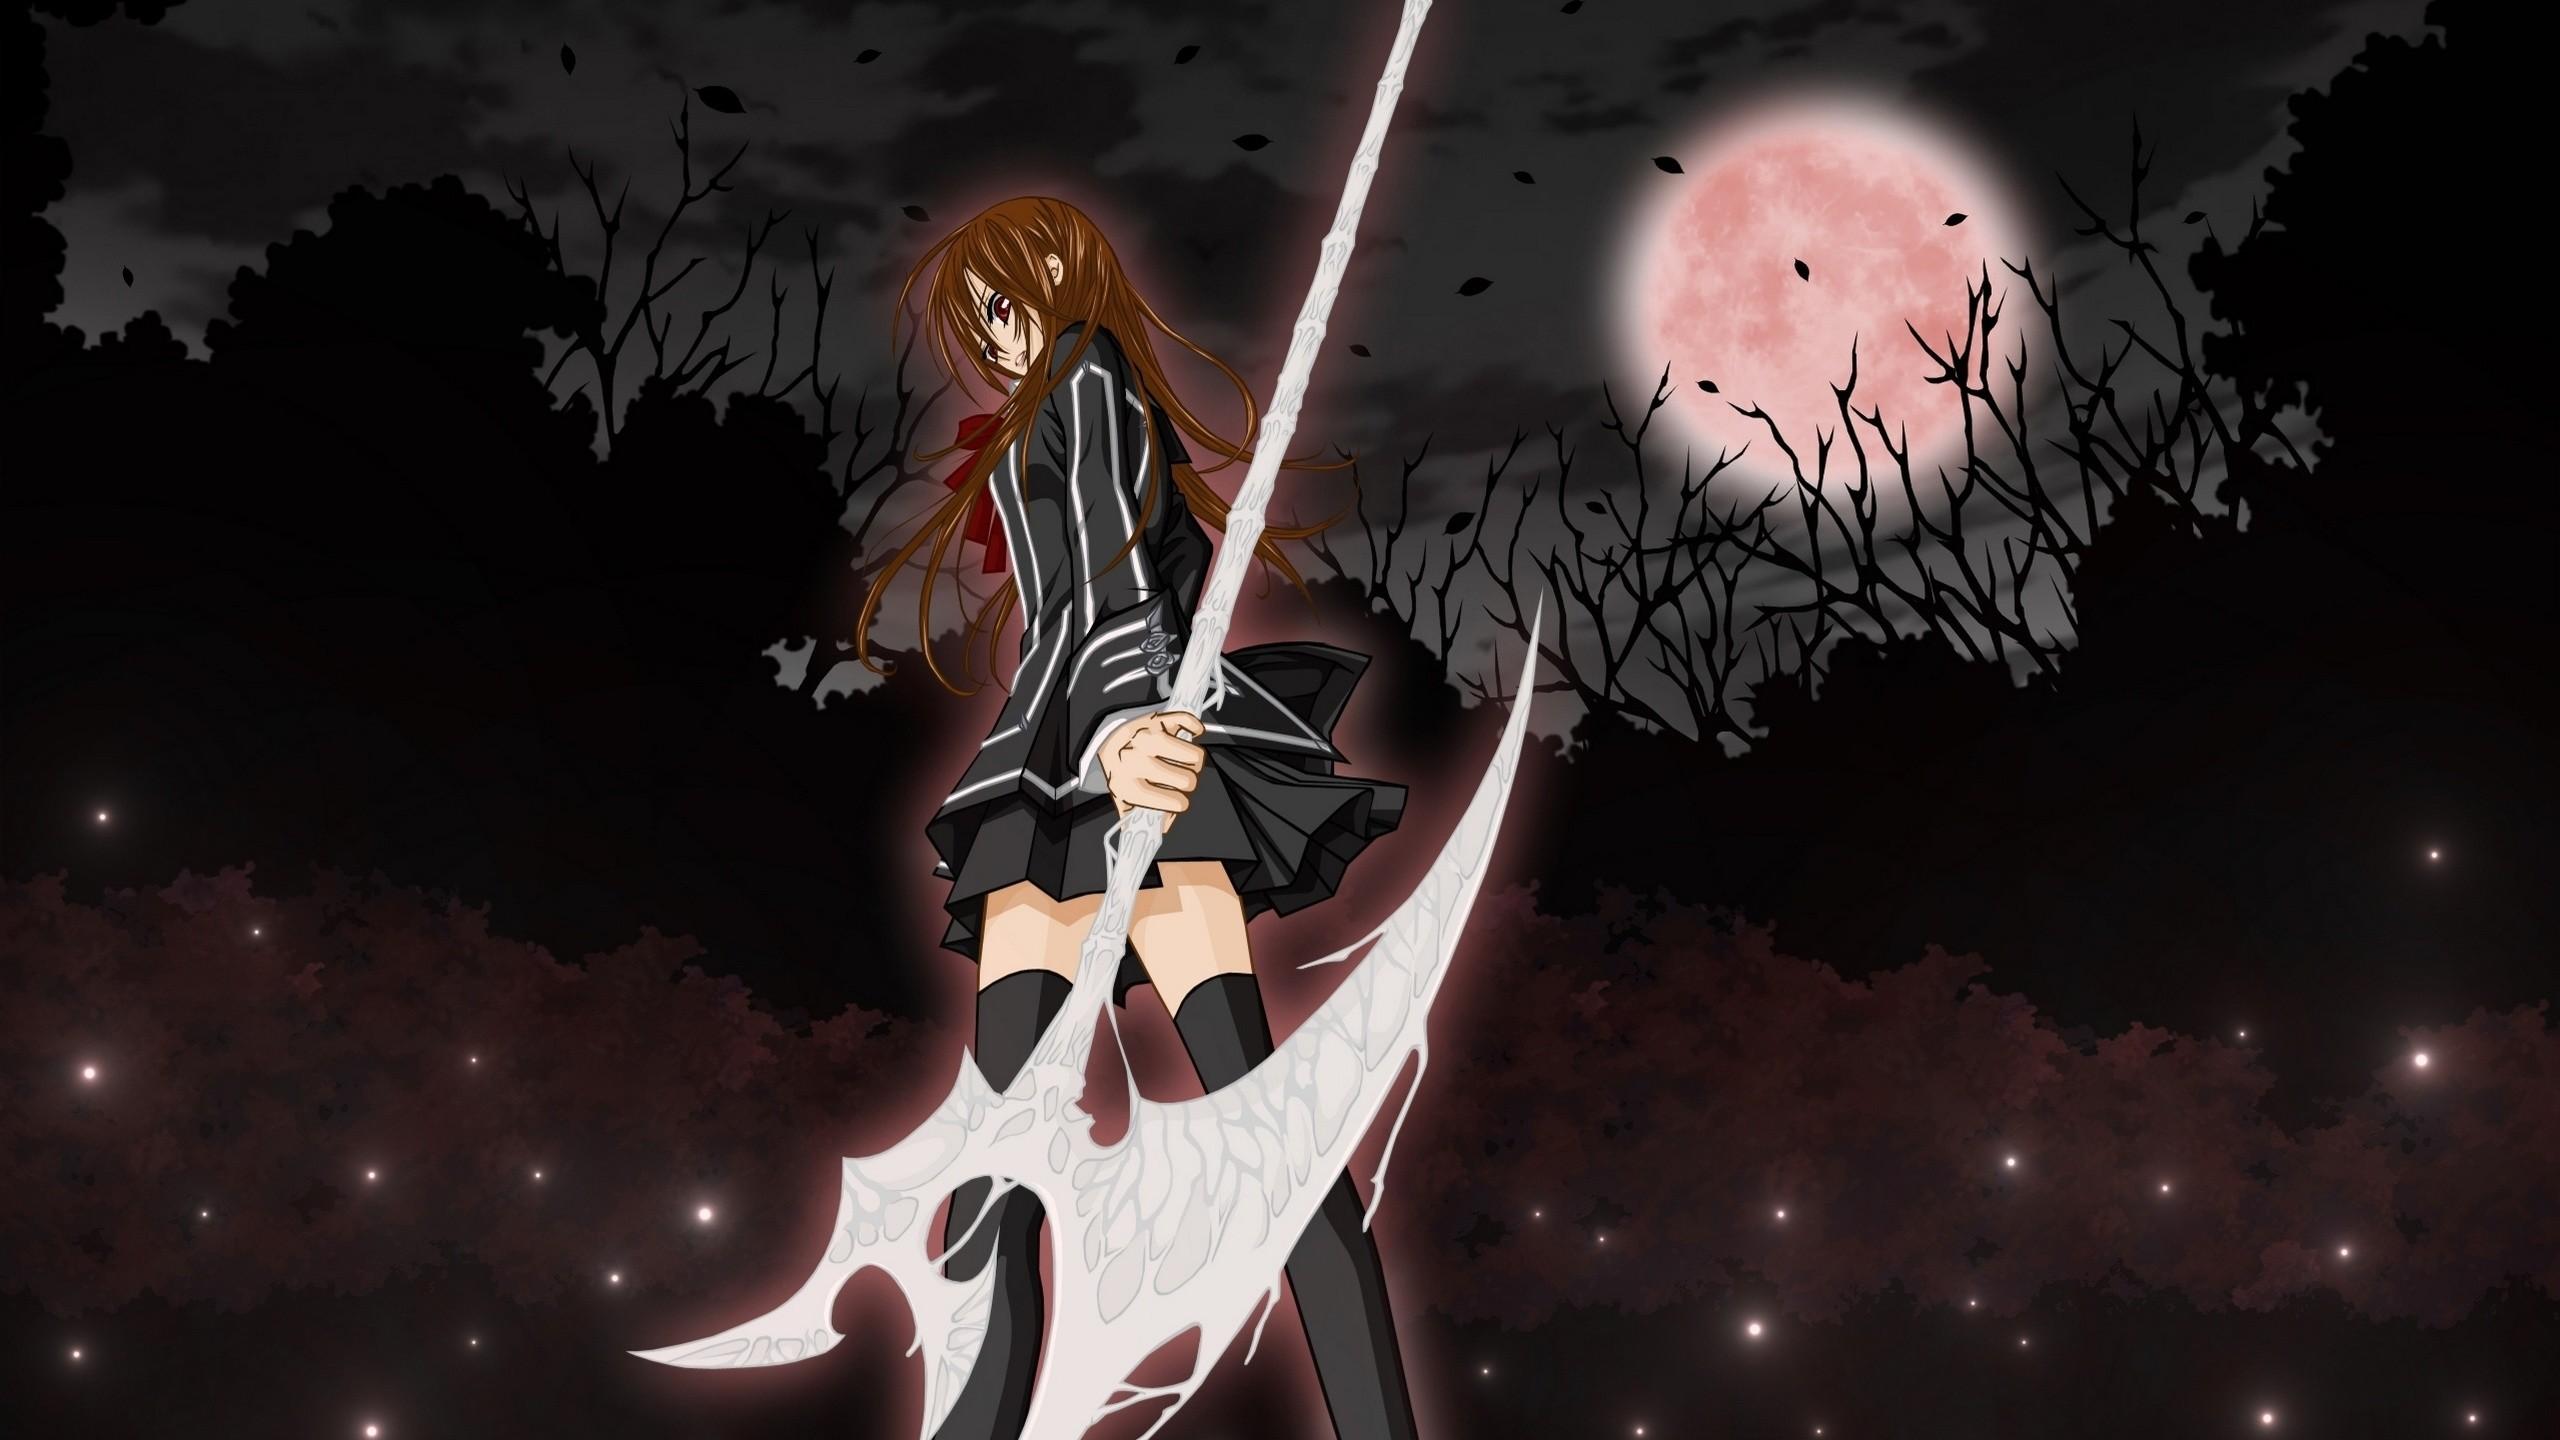 Vampire Knight, Yuki, Vampire-knight, The Moon, Girl, Yuki,